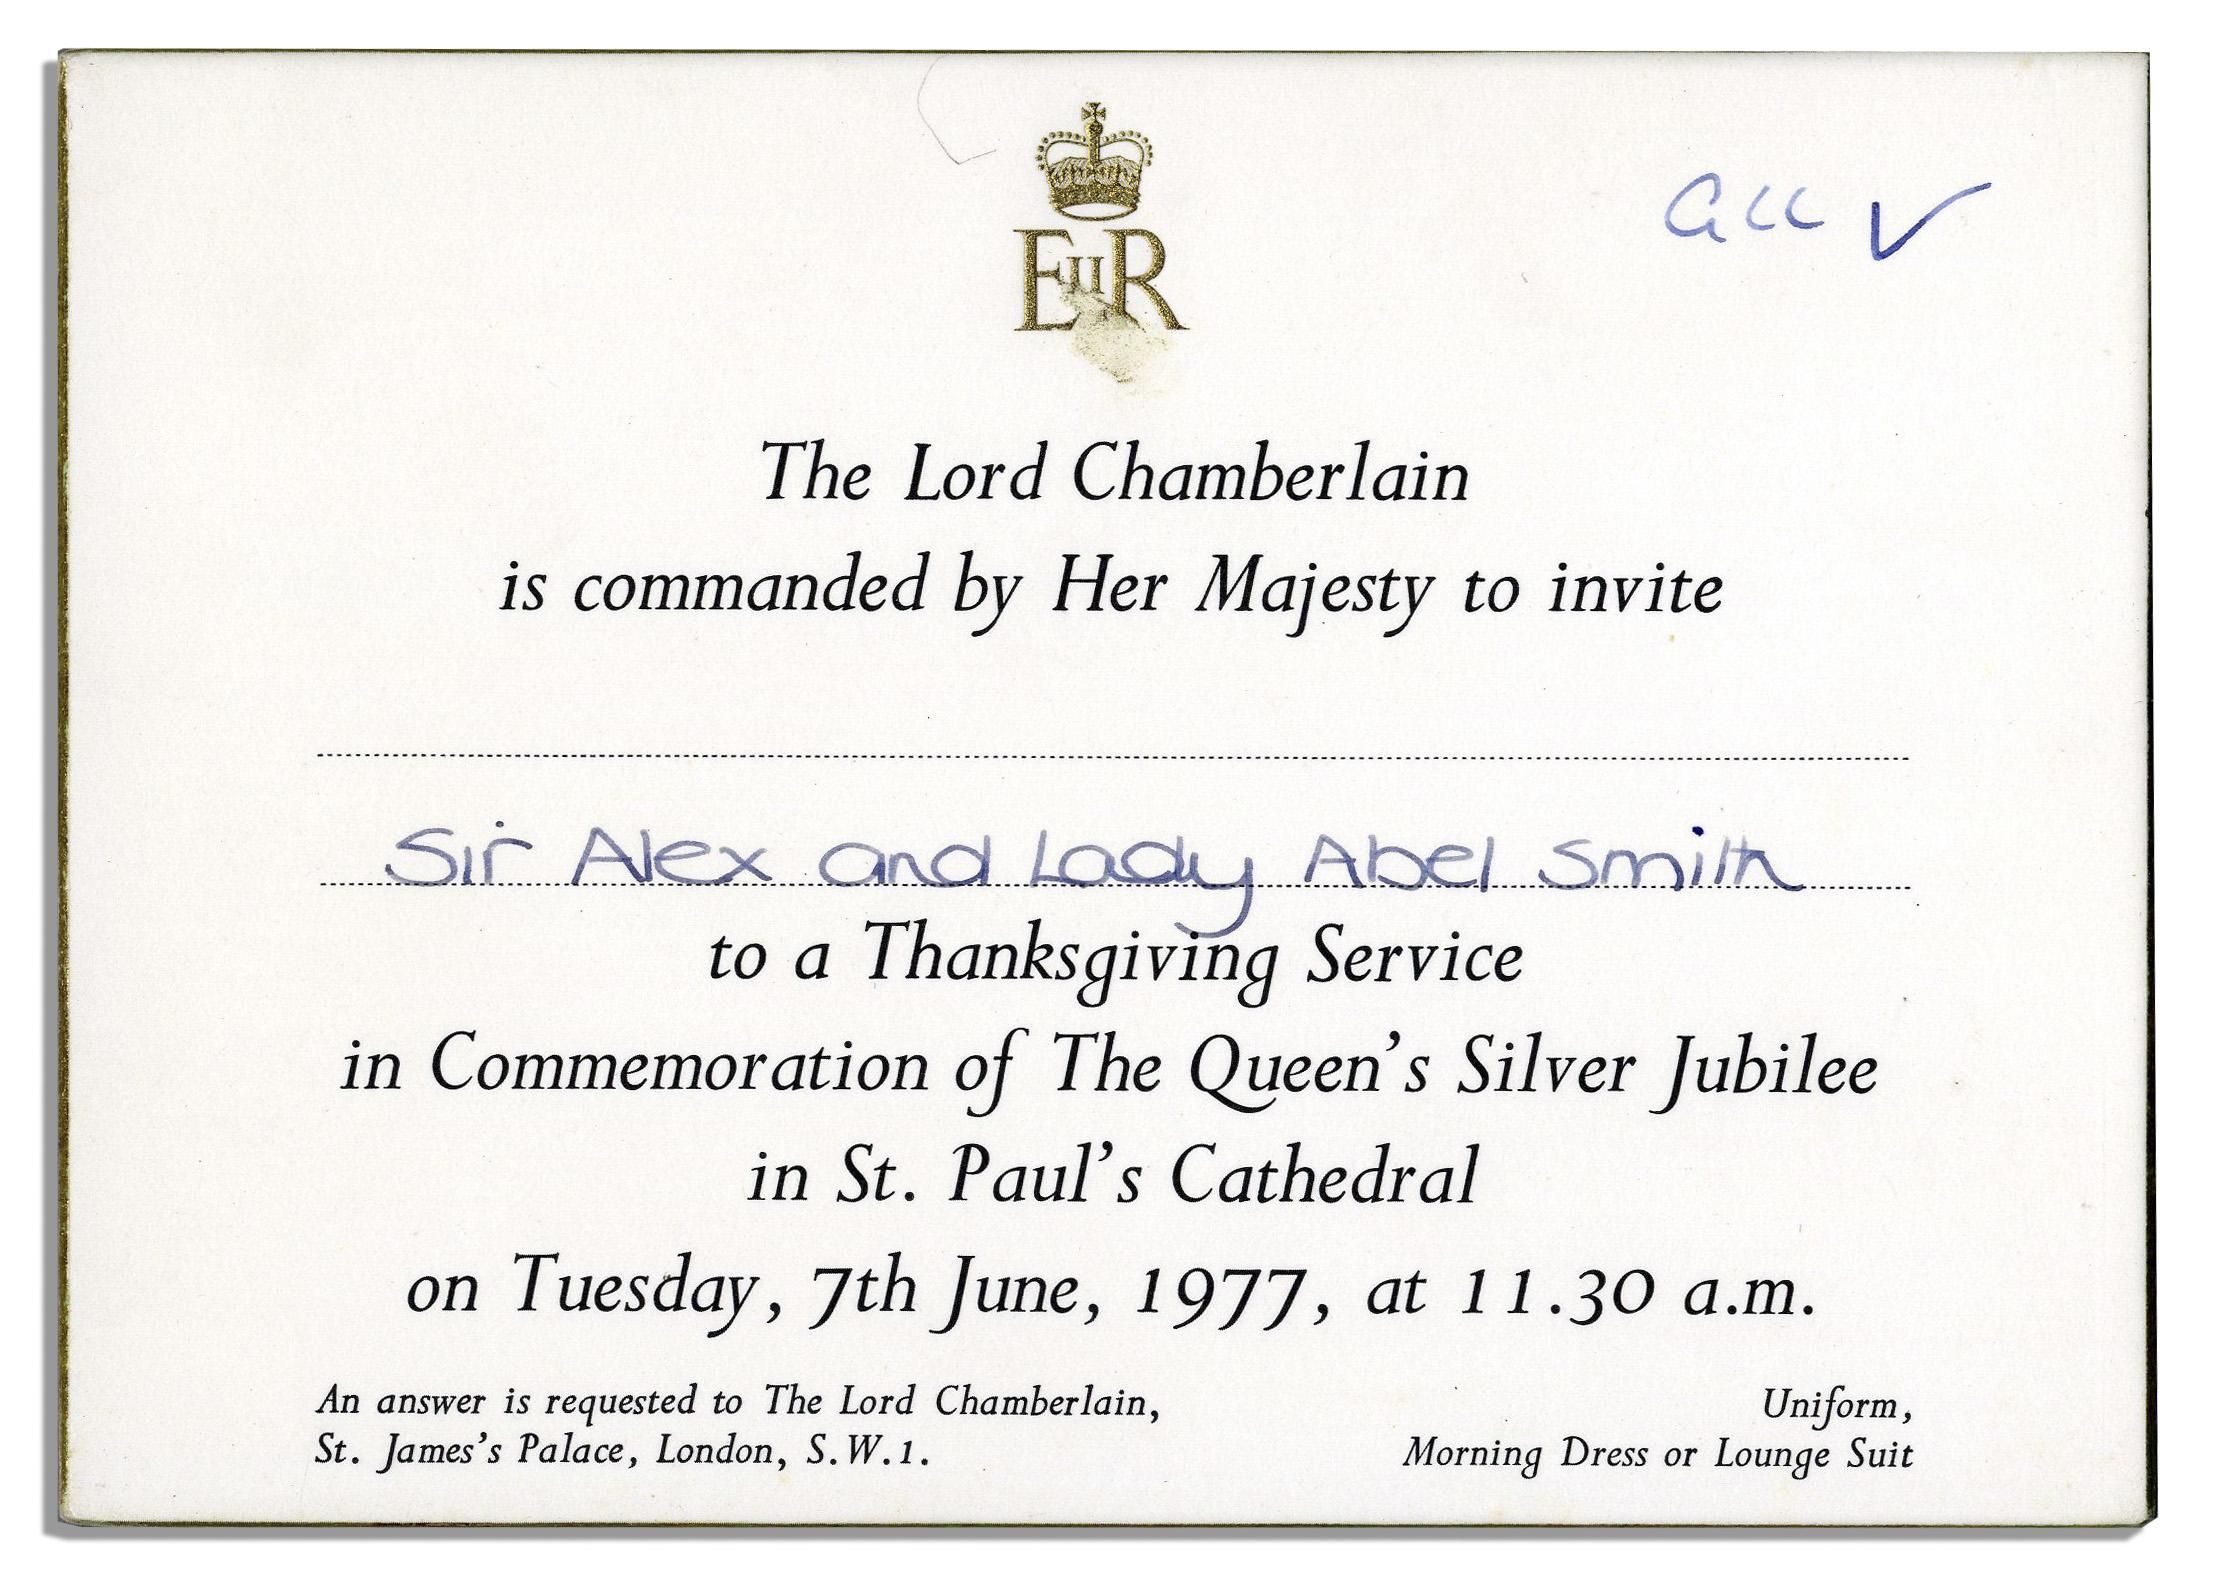 Lot detail queen elizabeth ii silver jubilee invitation in 1977 queen elizabeth ii silver jubilee invitation in 1977 honoring her 25 year anniversary as queen stopboris Choice Image